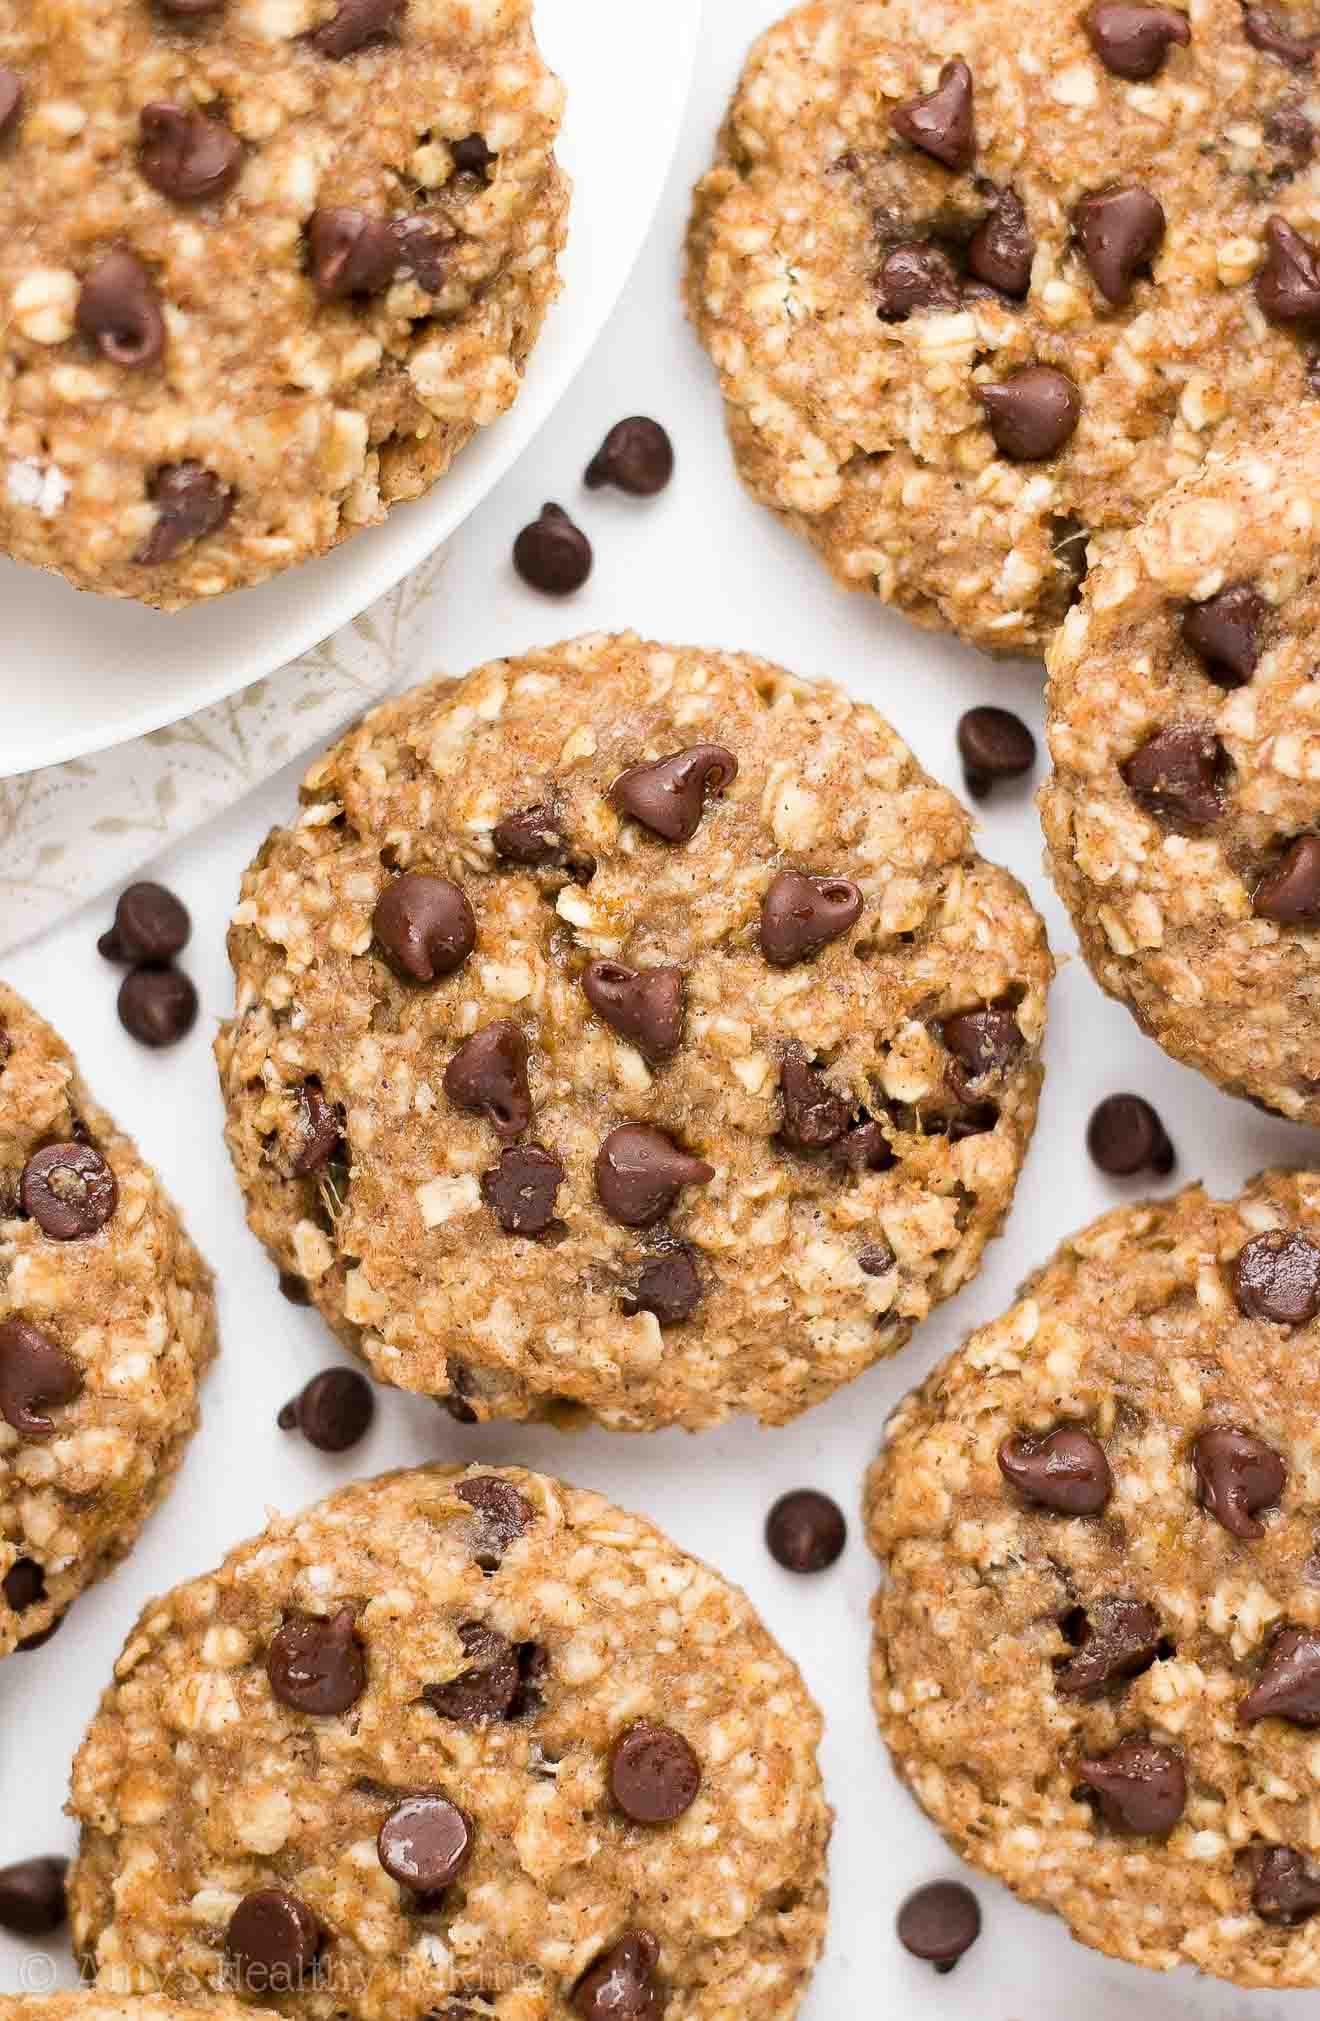 Oatmeal Banana Cookies Healthy  Healthy Chocolate Chip Banana Oatmeal Breakfast Cookies